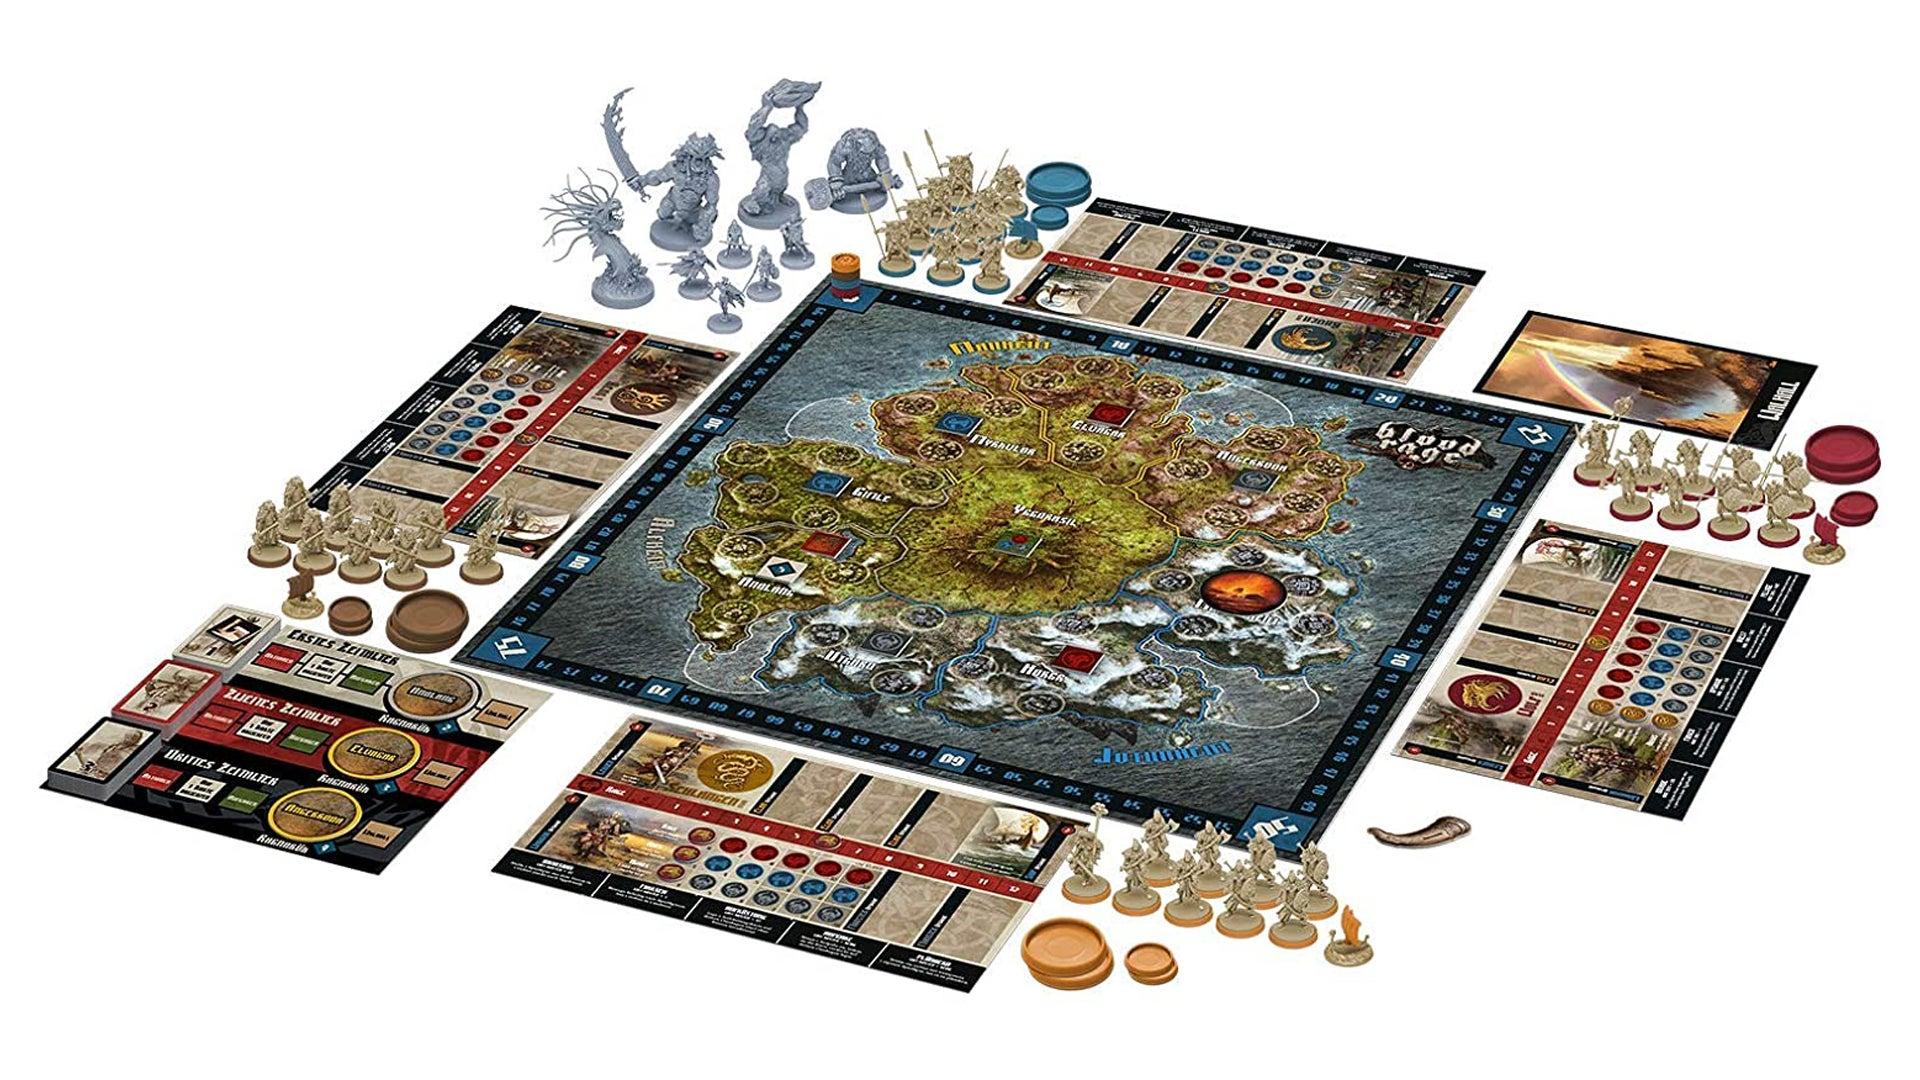 blood-rage-board-game-gameplay-layout.jpg